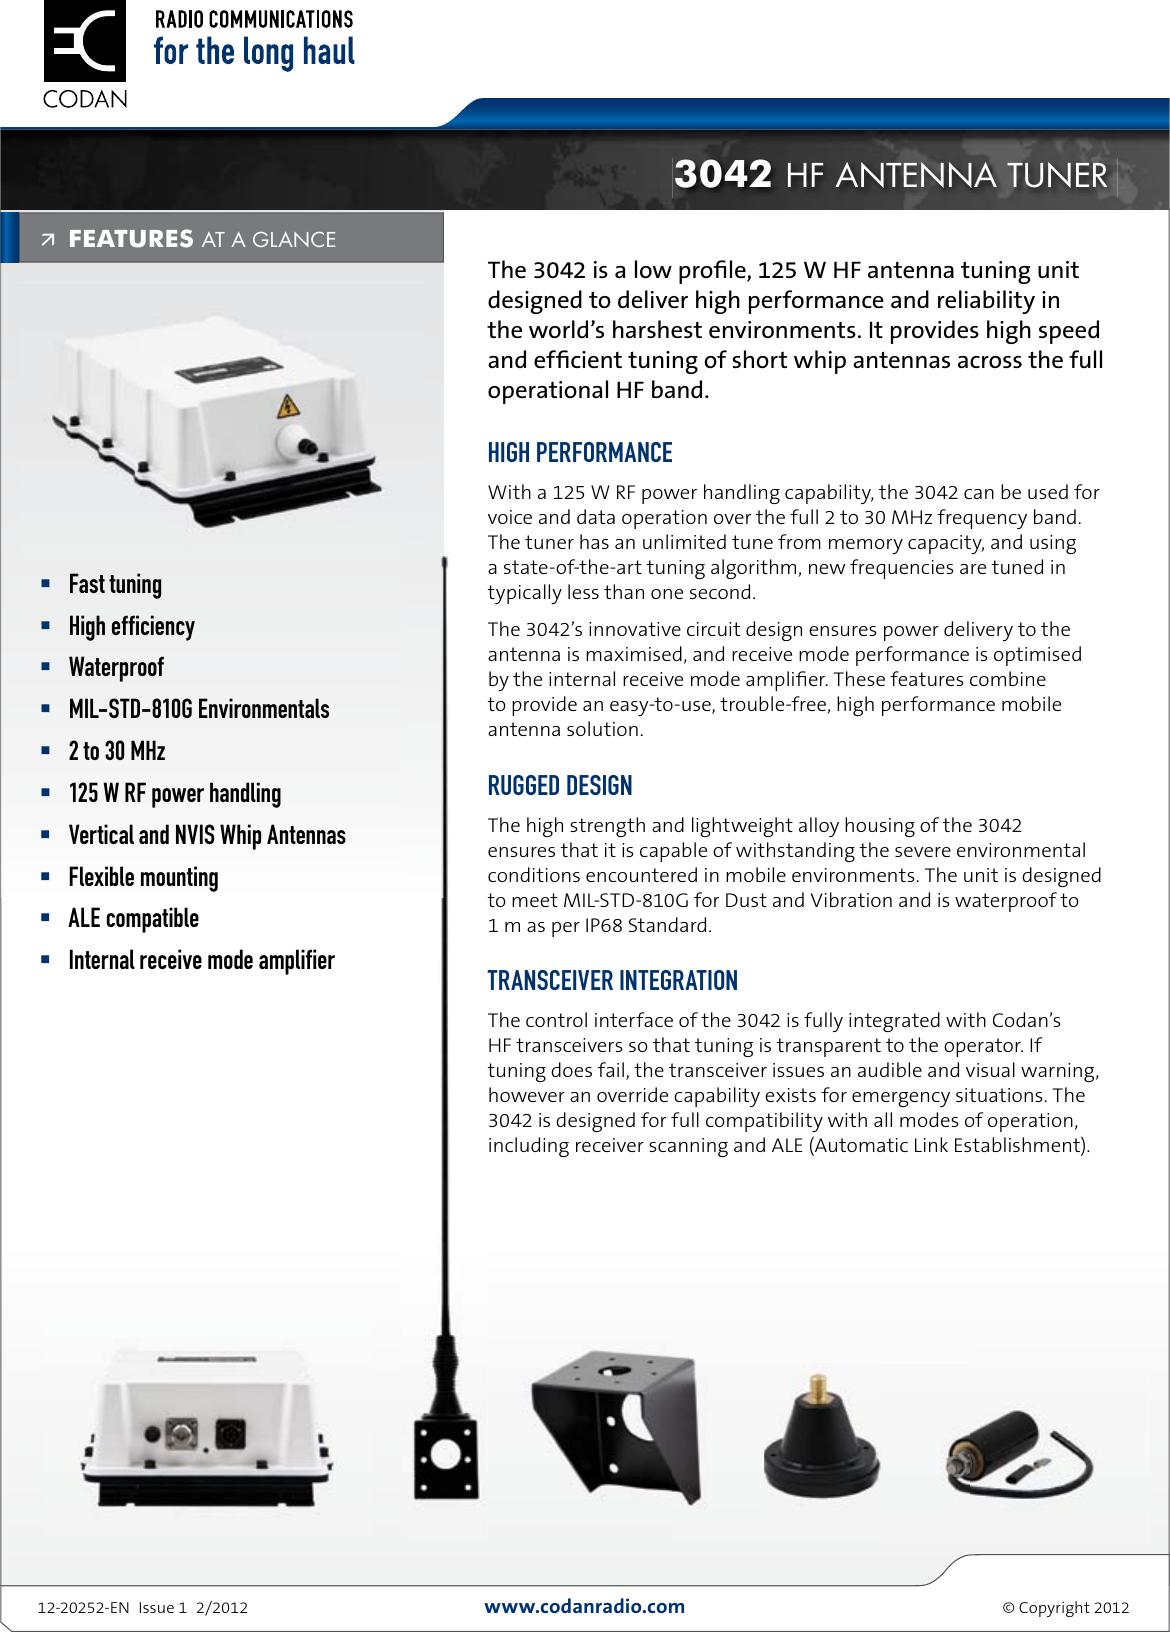 Codan 3042 hf antenna tuner datasheet